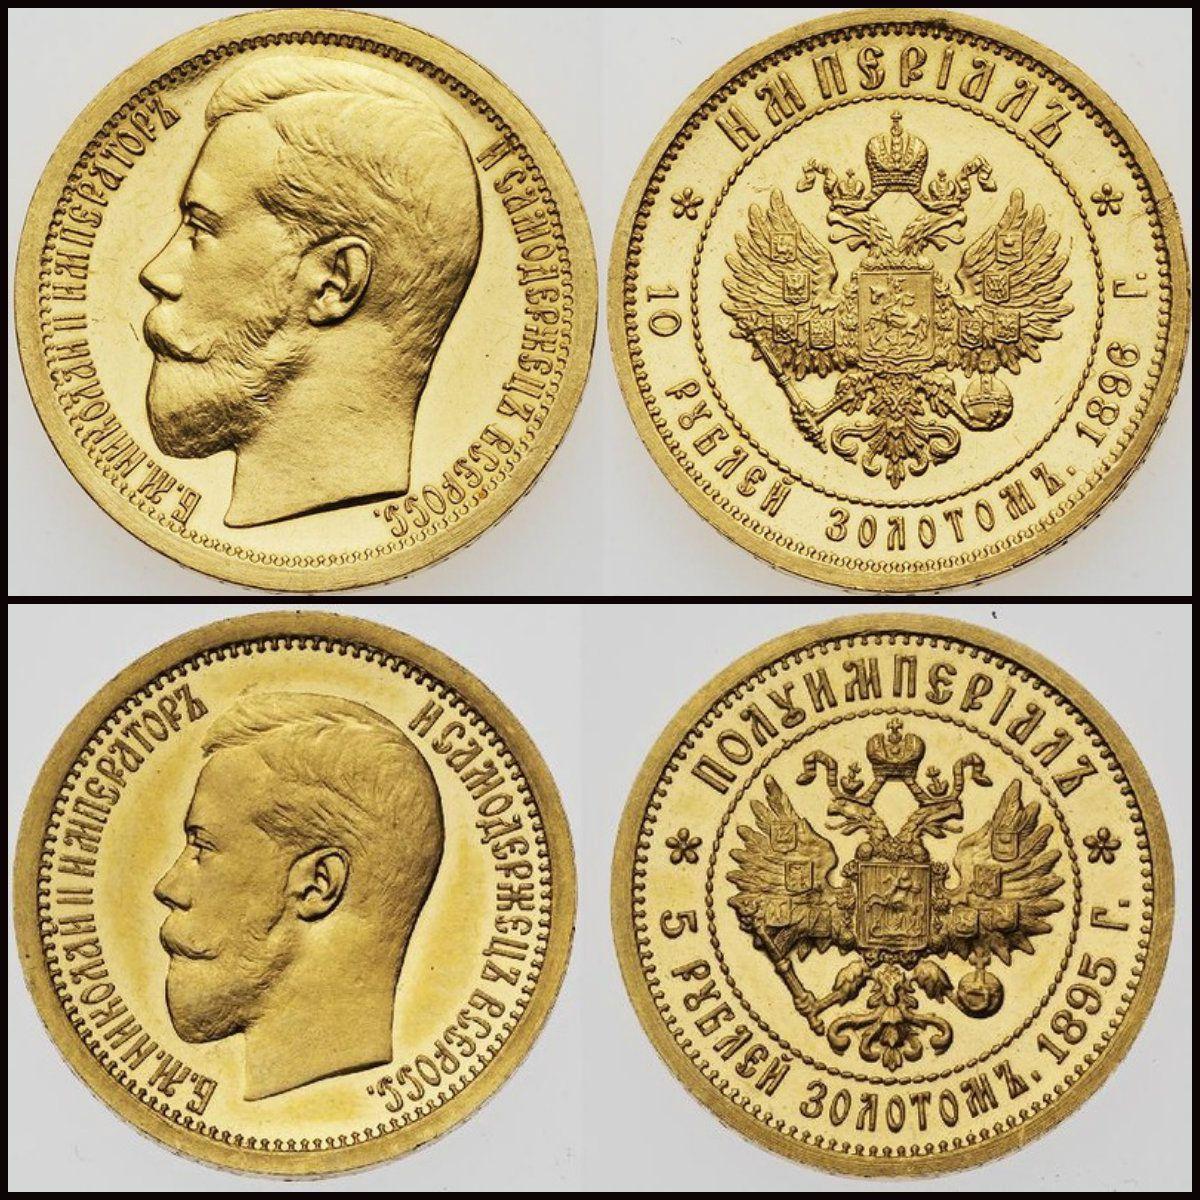 Сколько весит монета николаевские 5 рублей yubileinie moneti